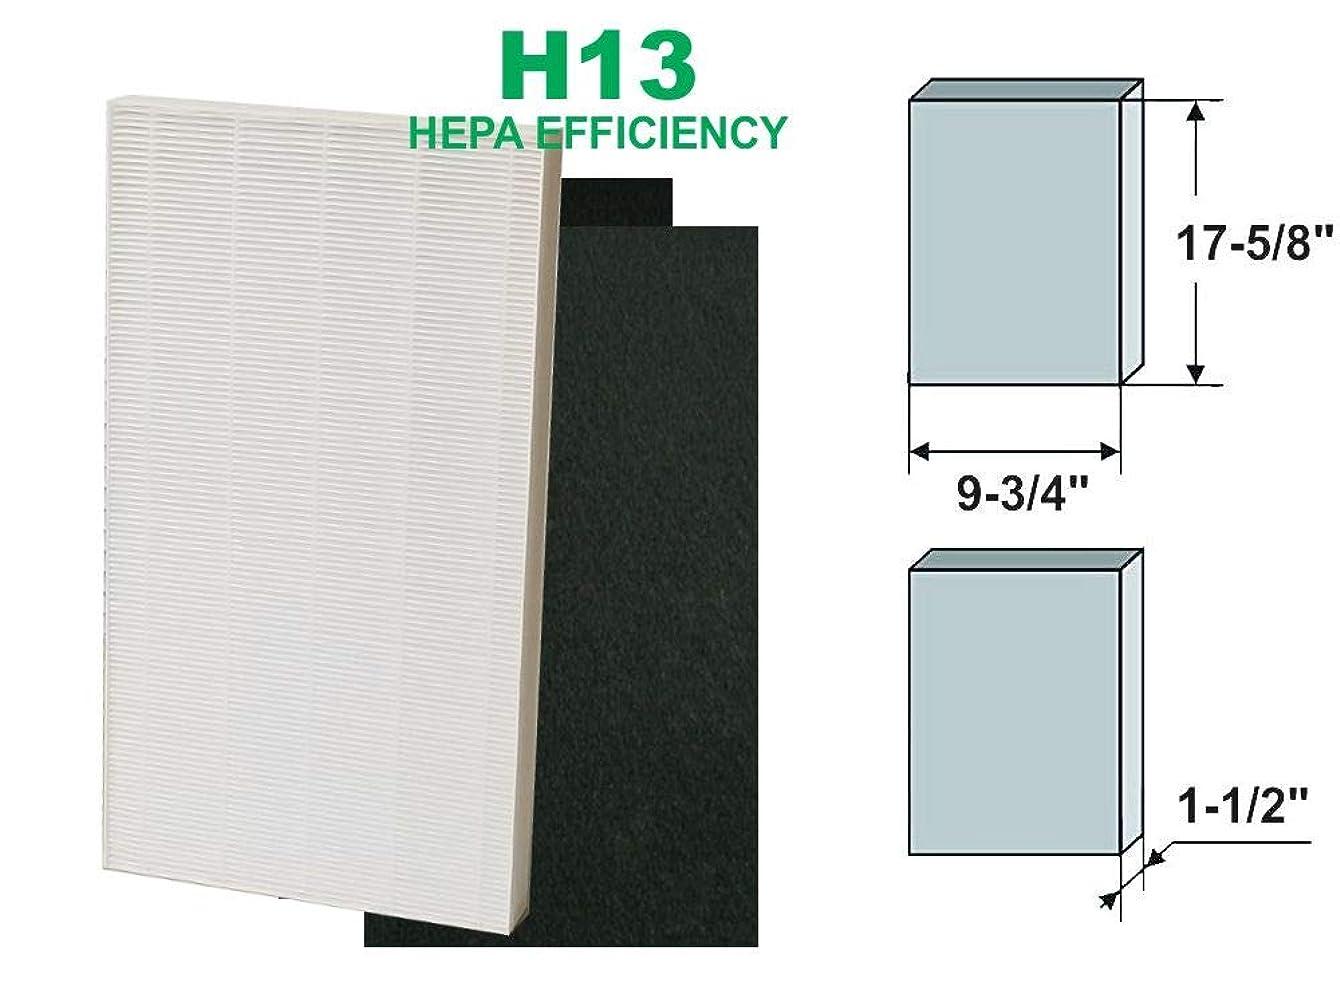 GoodVac Sharp Non-OEM HEPA FZ-C150HFU KC-860U Air Purifier Filter with 2 Pre-Filters